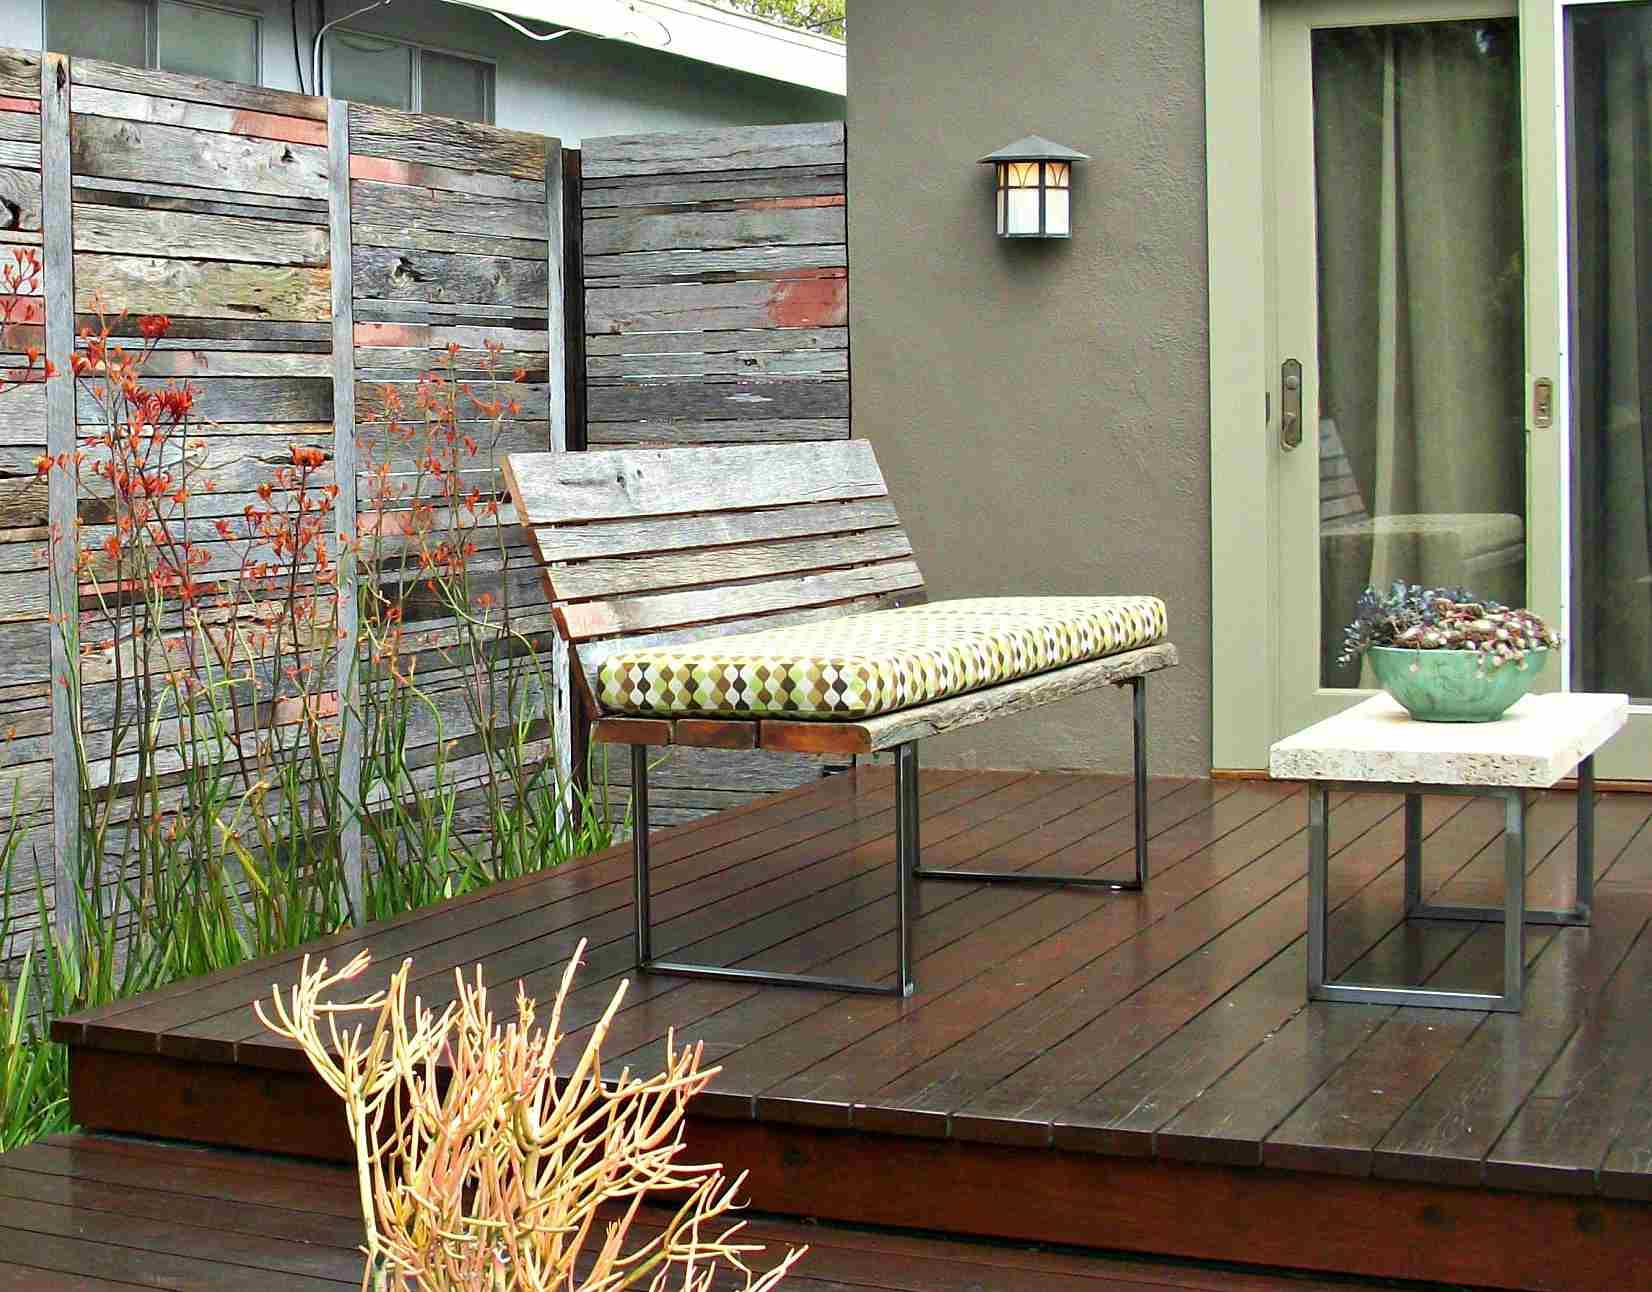 Astounding 15 Garden Bench Ideas For Your Backyard Gamerscity Chair Design For Home Gamerscityorg